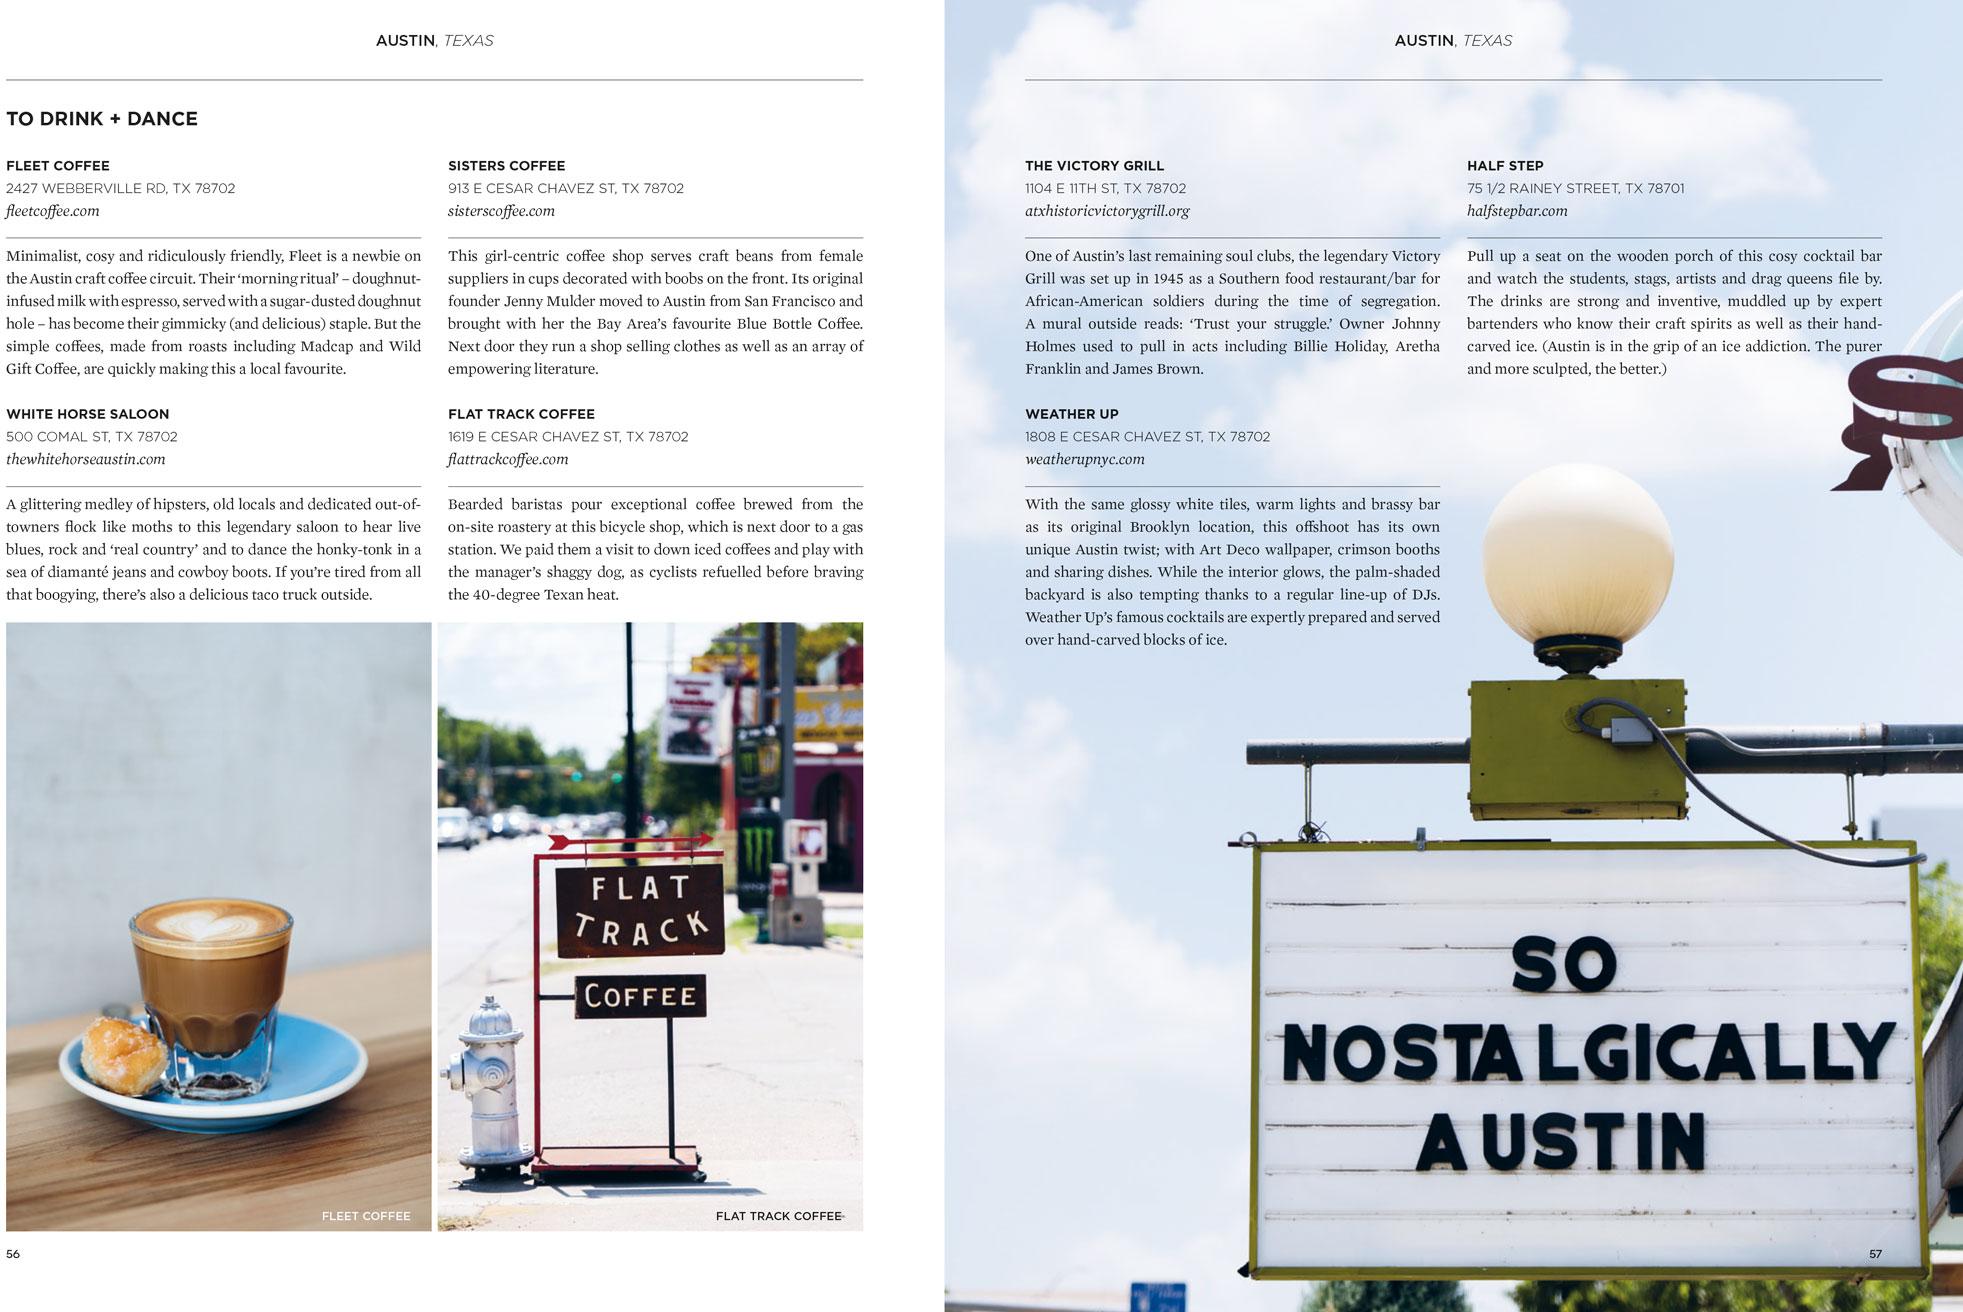 SUITCASE-Vol.16-Austin-Guide-4.jpg